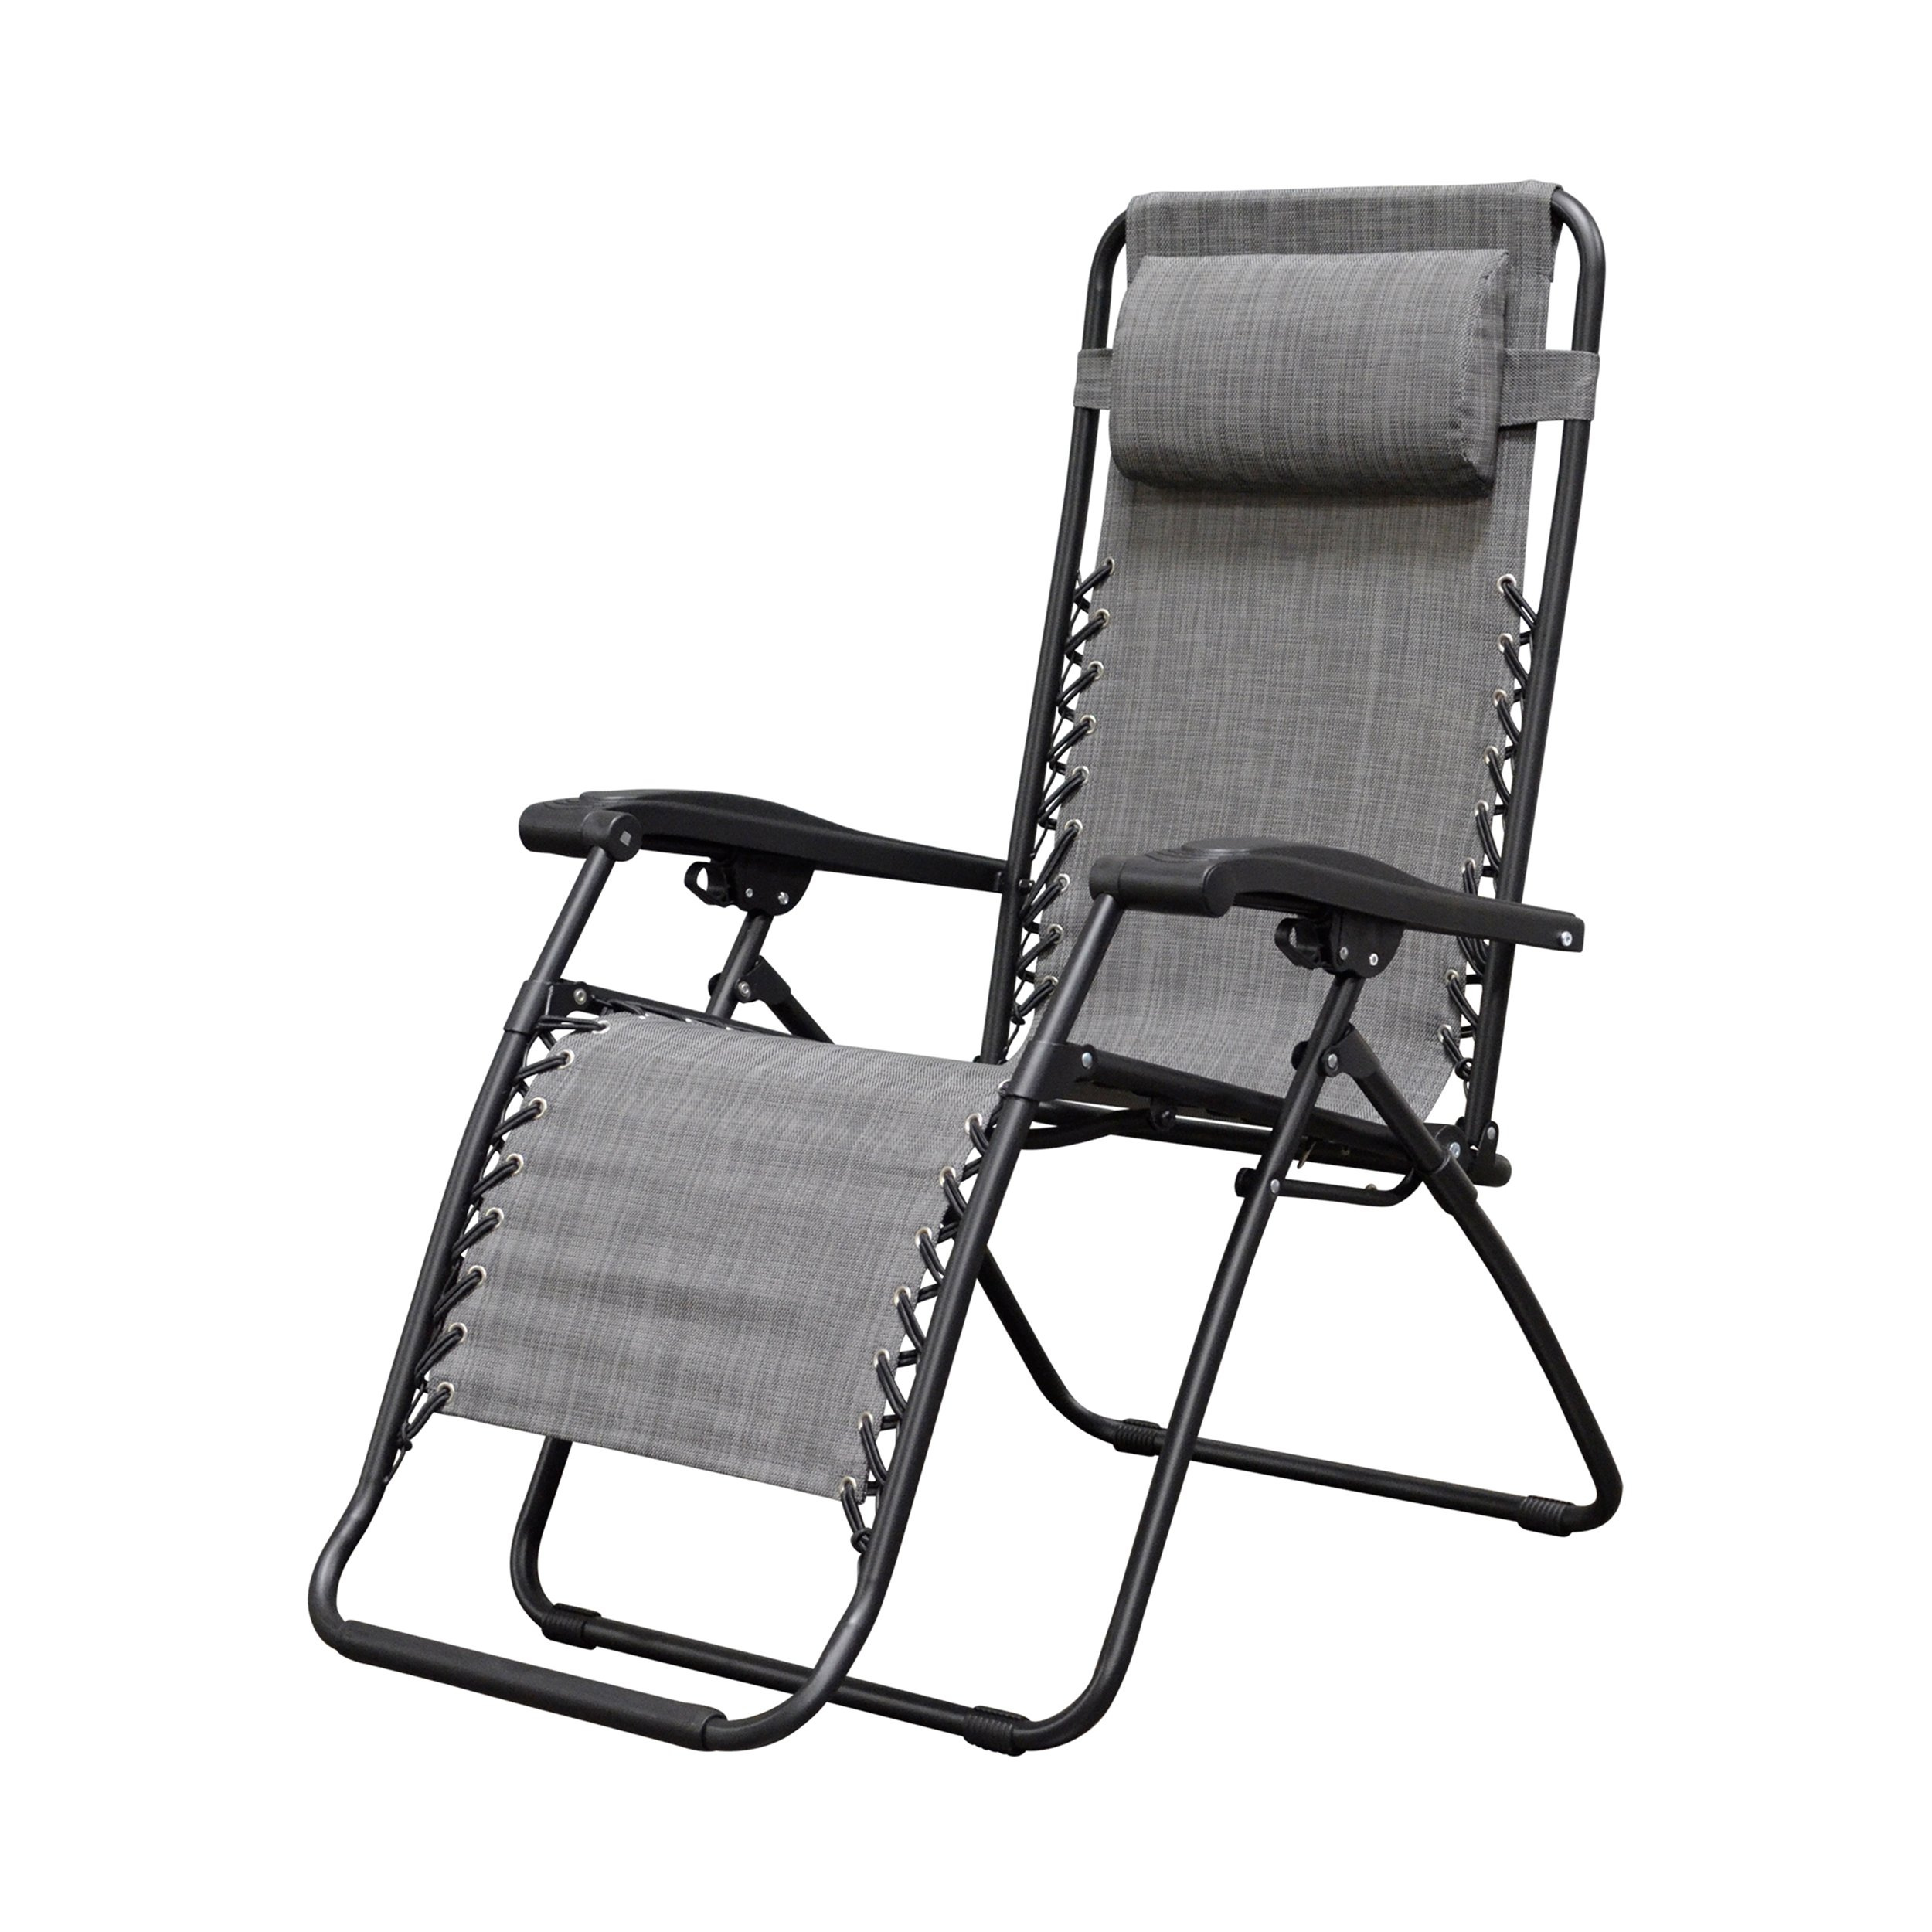 Caravan Sports Infinity Zero Gravity Chair, Grey by Caravan Sports